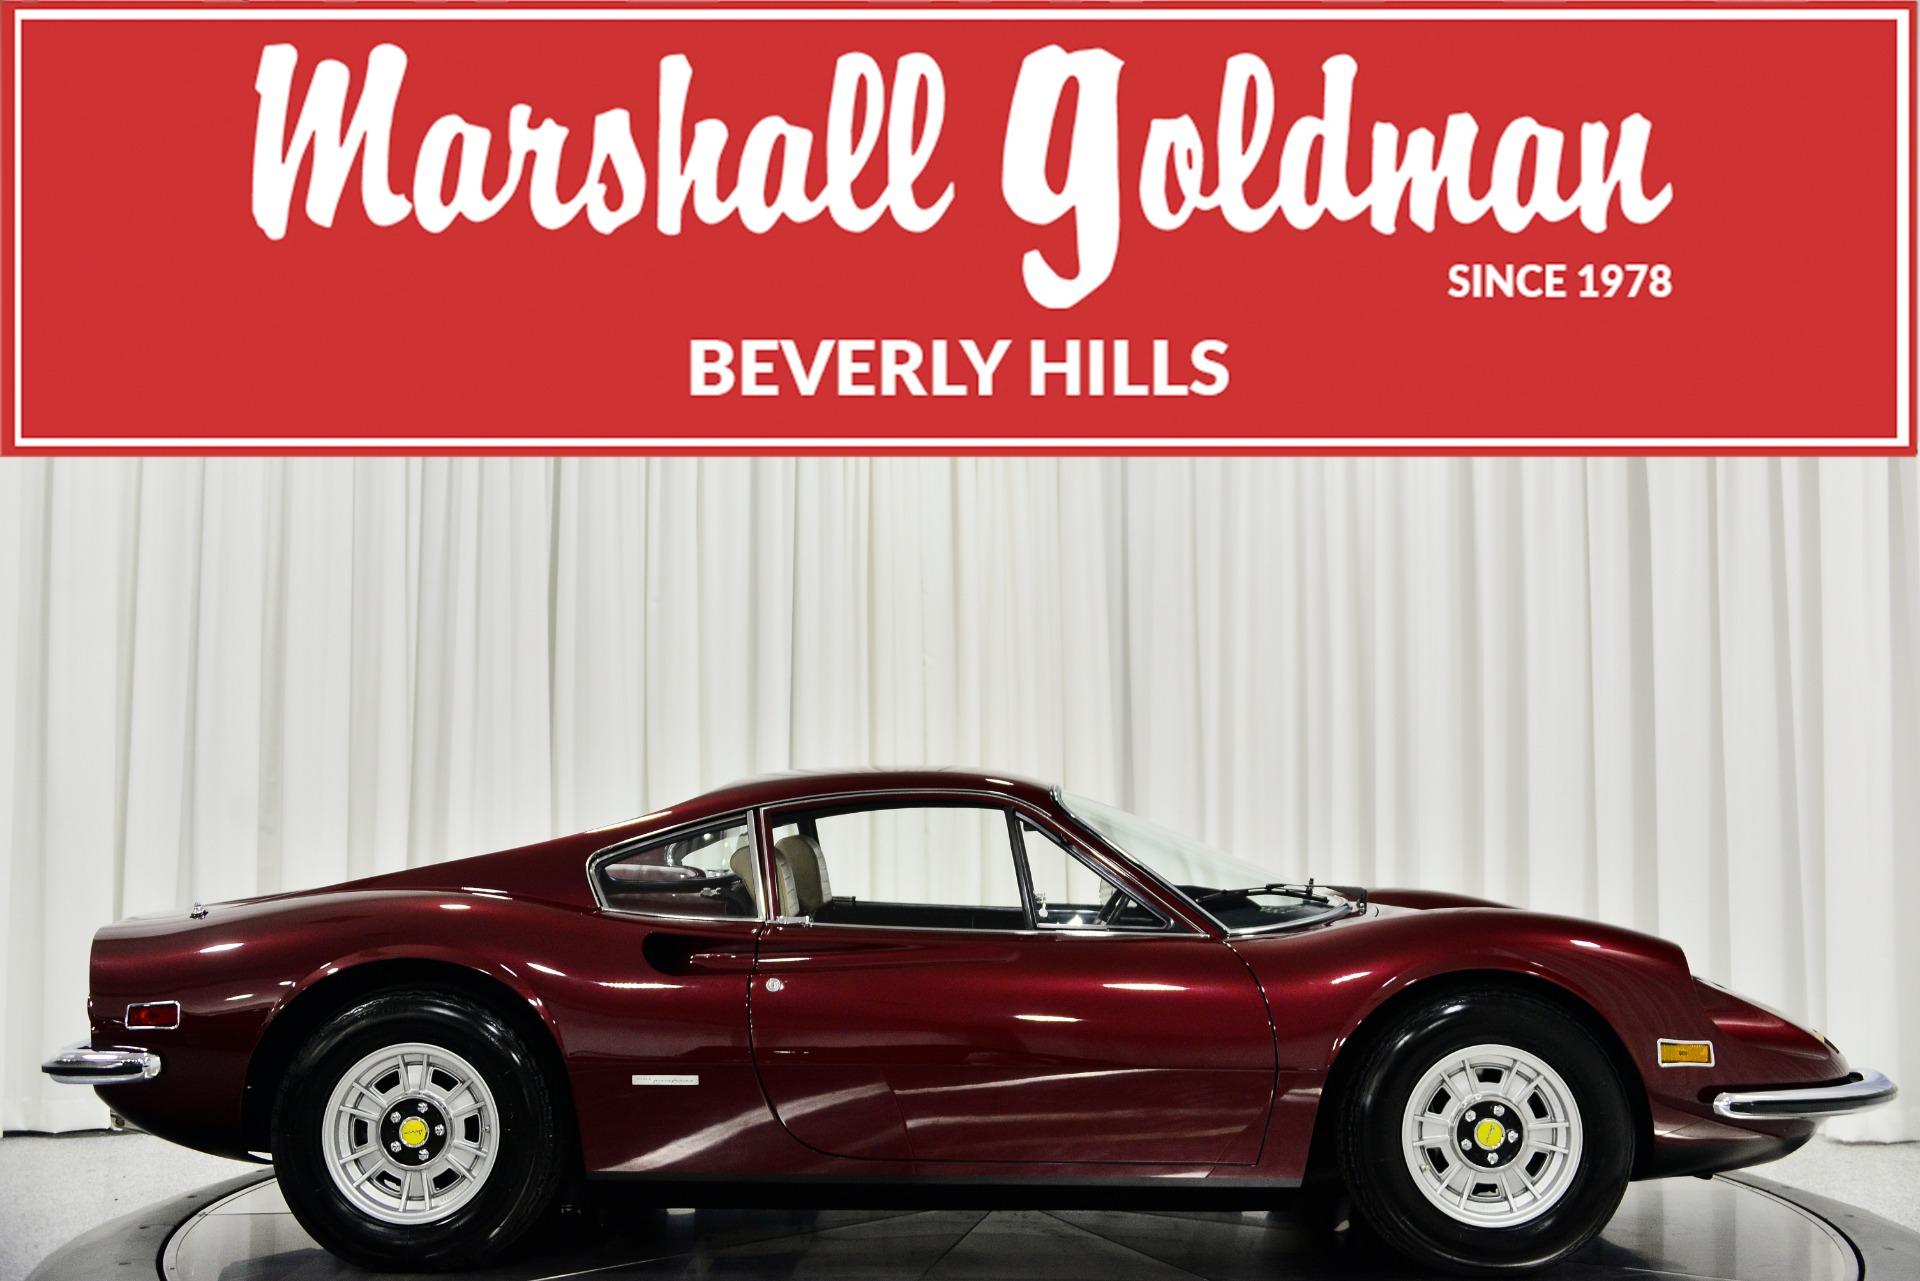 Used 1973 Ferrari Dino 246gt For Sale 395 900 Marshall Goldman Cleveland Stock B20328